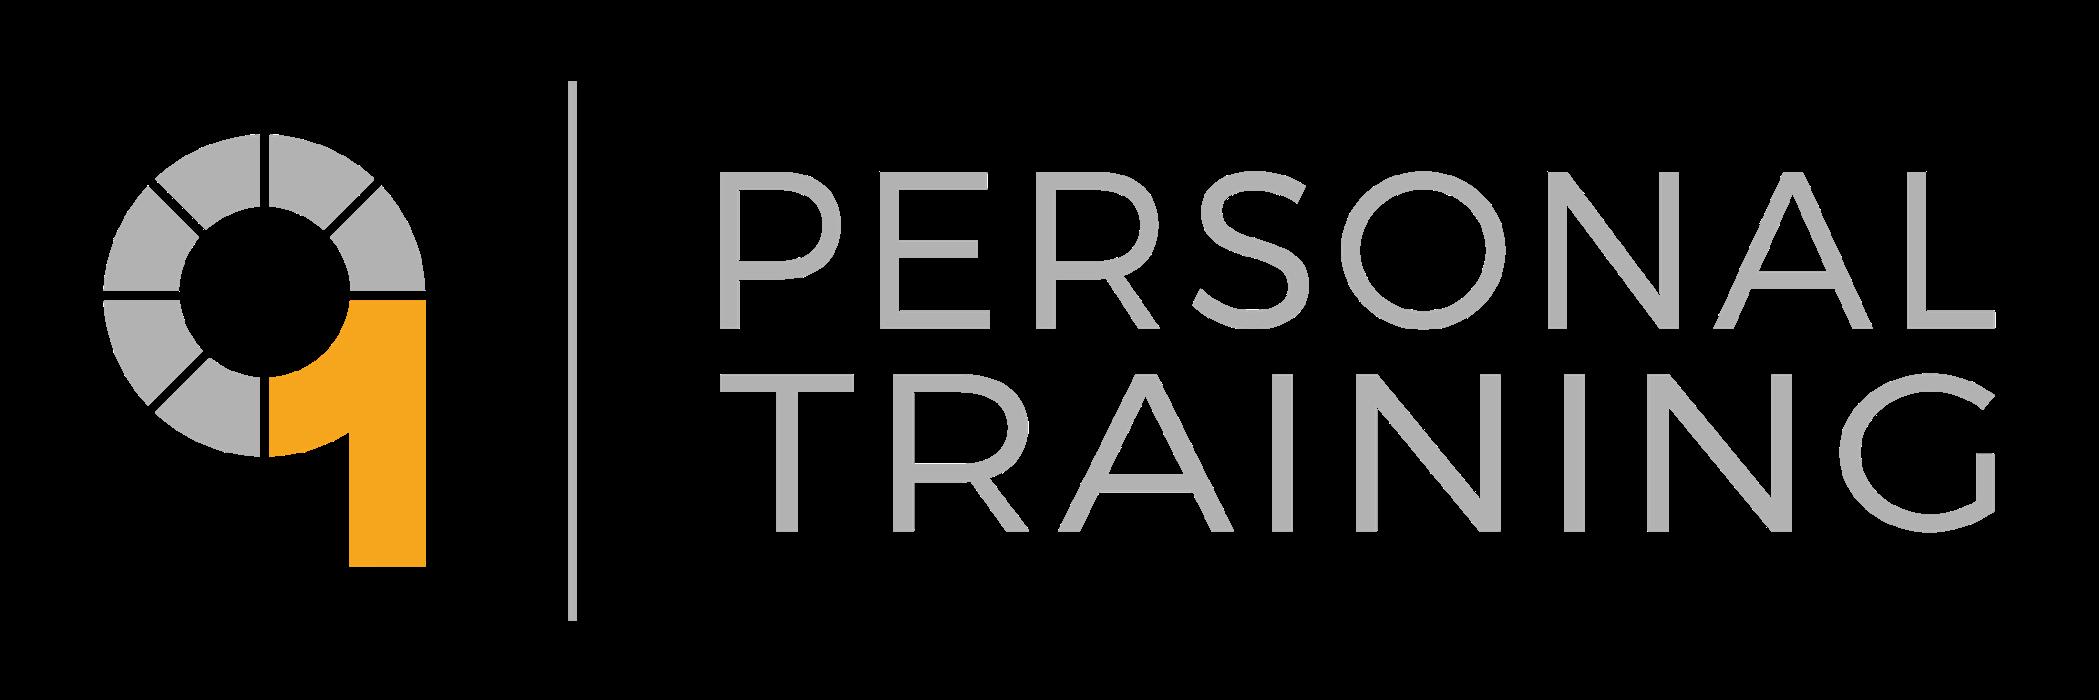 Bild zu Q1 Personal Training GmbH in Heidelberg